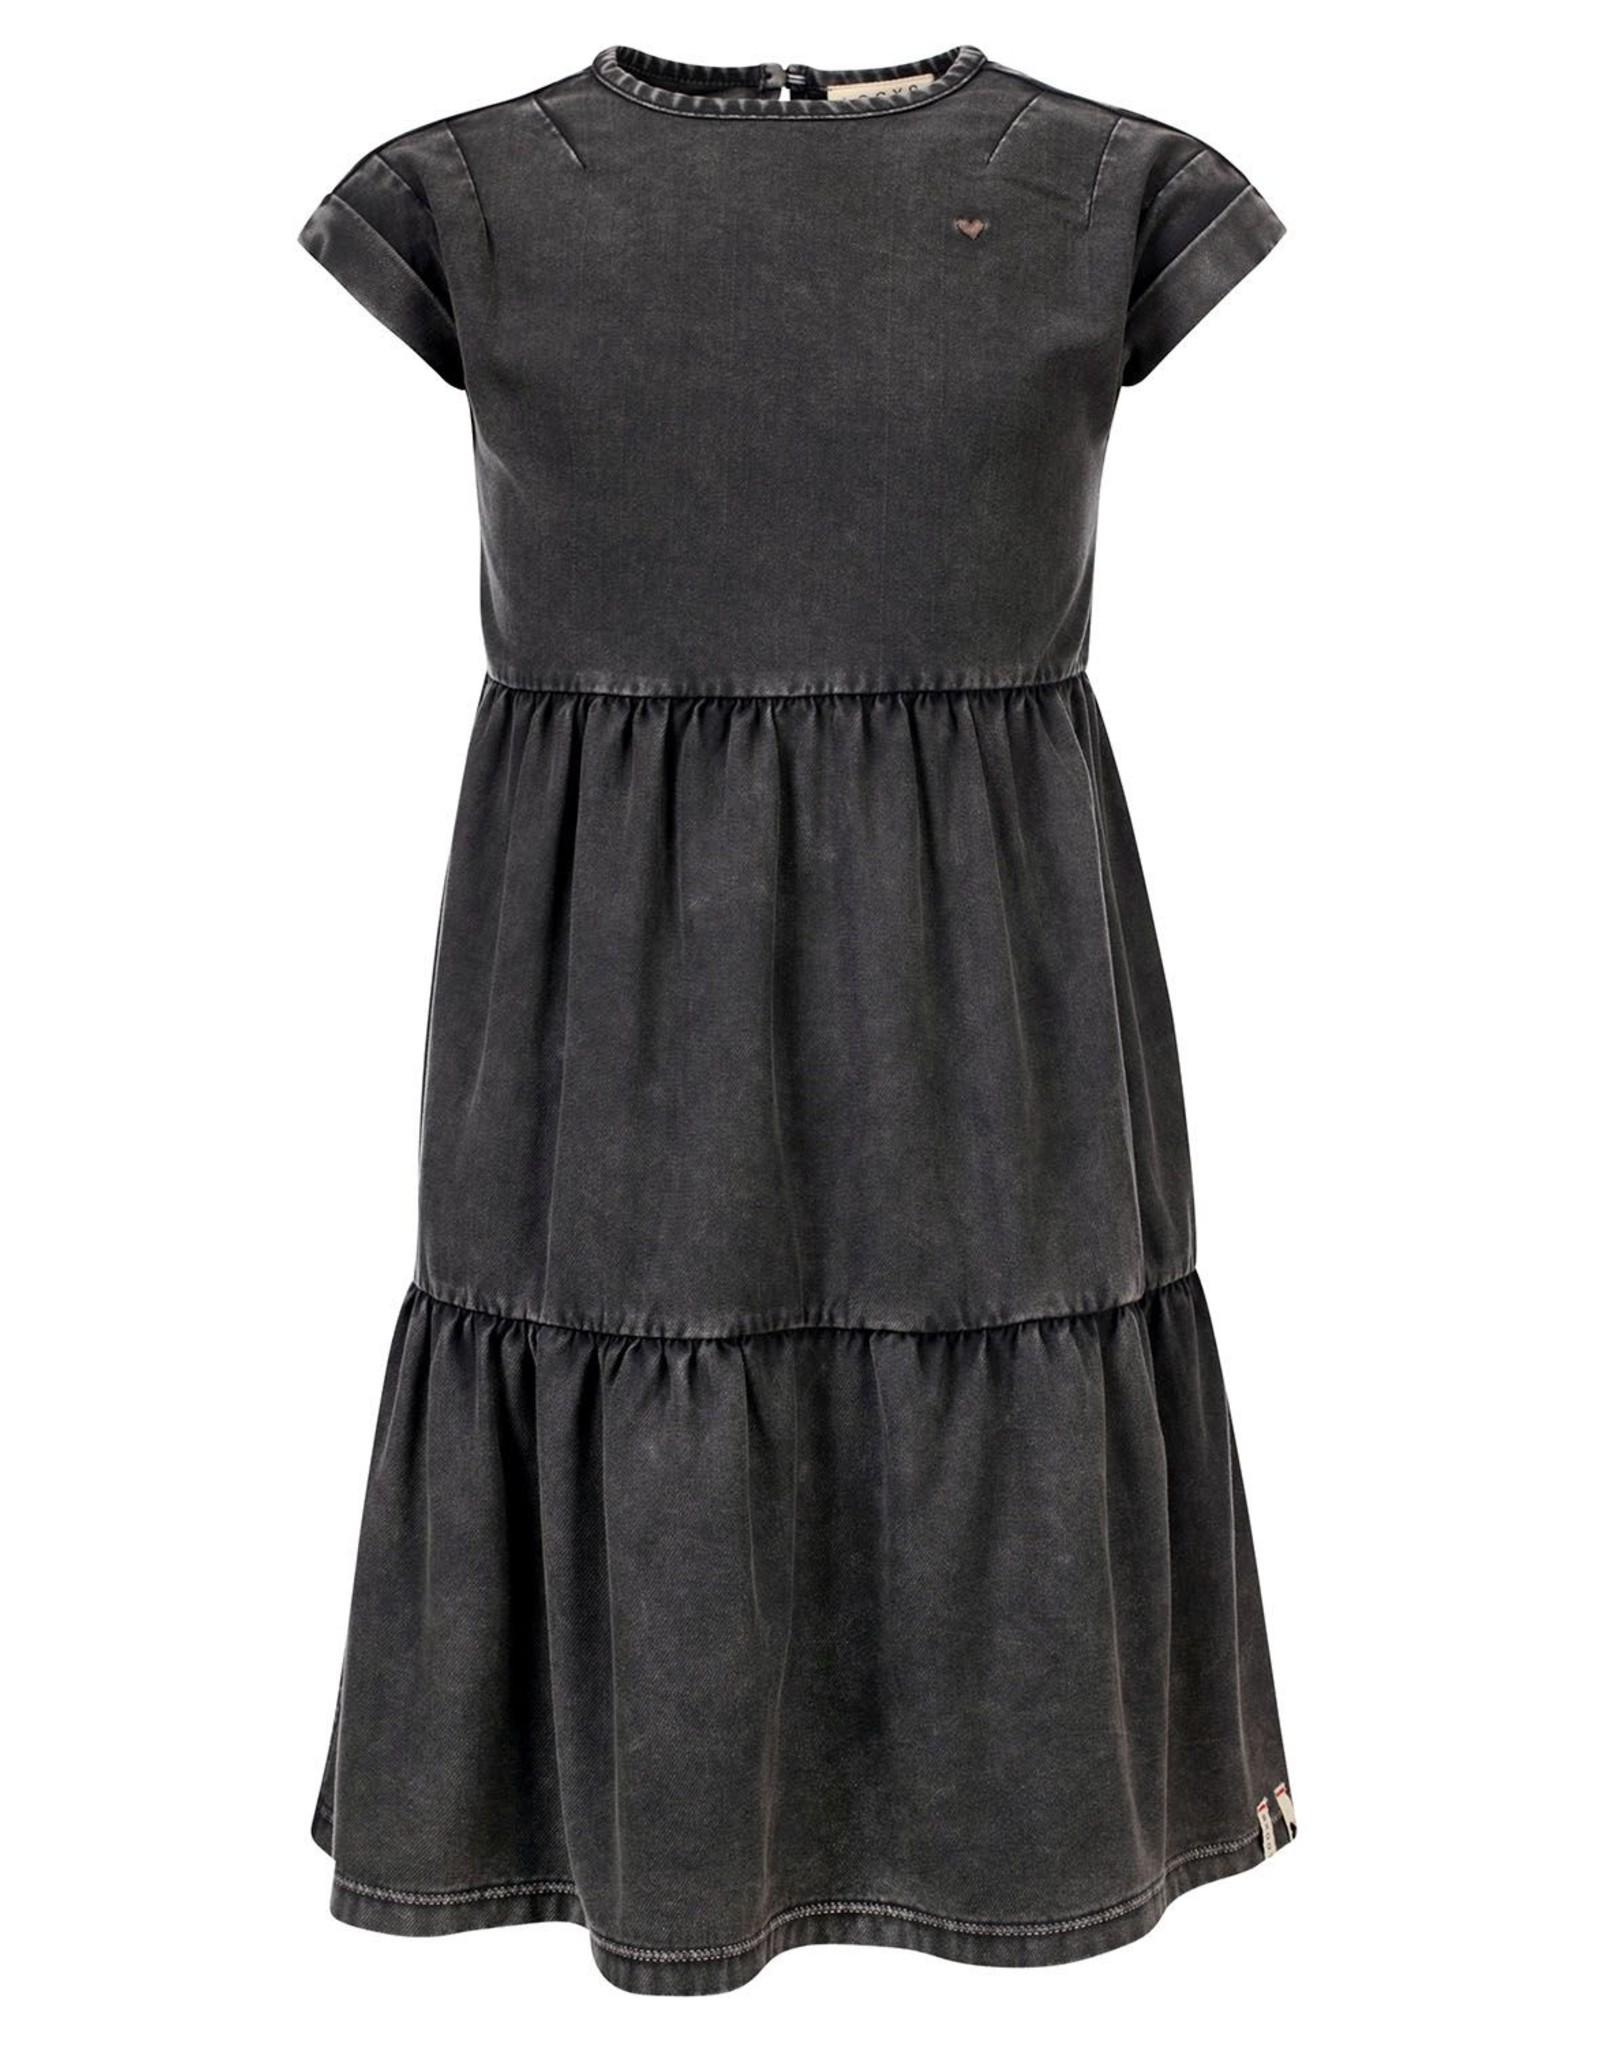 LOOXS Little Little dress STONE